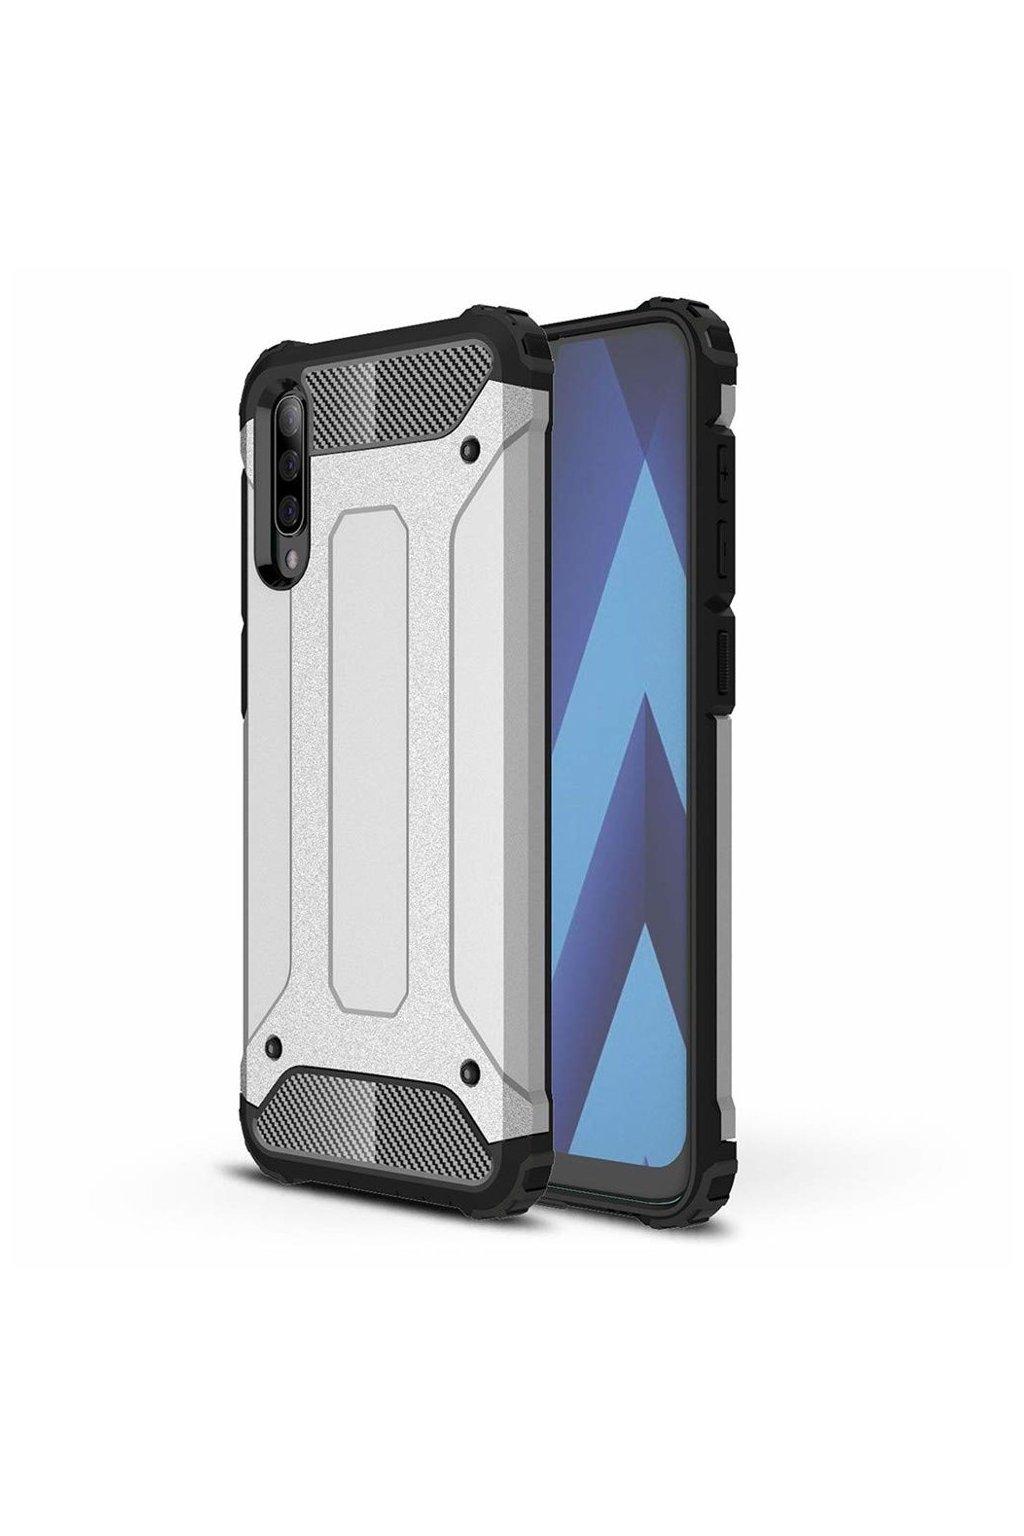 eng pl Hybrid Armor Case Tough Rugged Cover for Samsung Galaxy A70 silver 50380 1